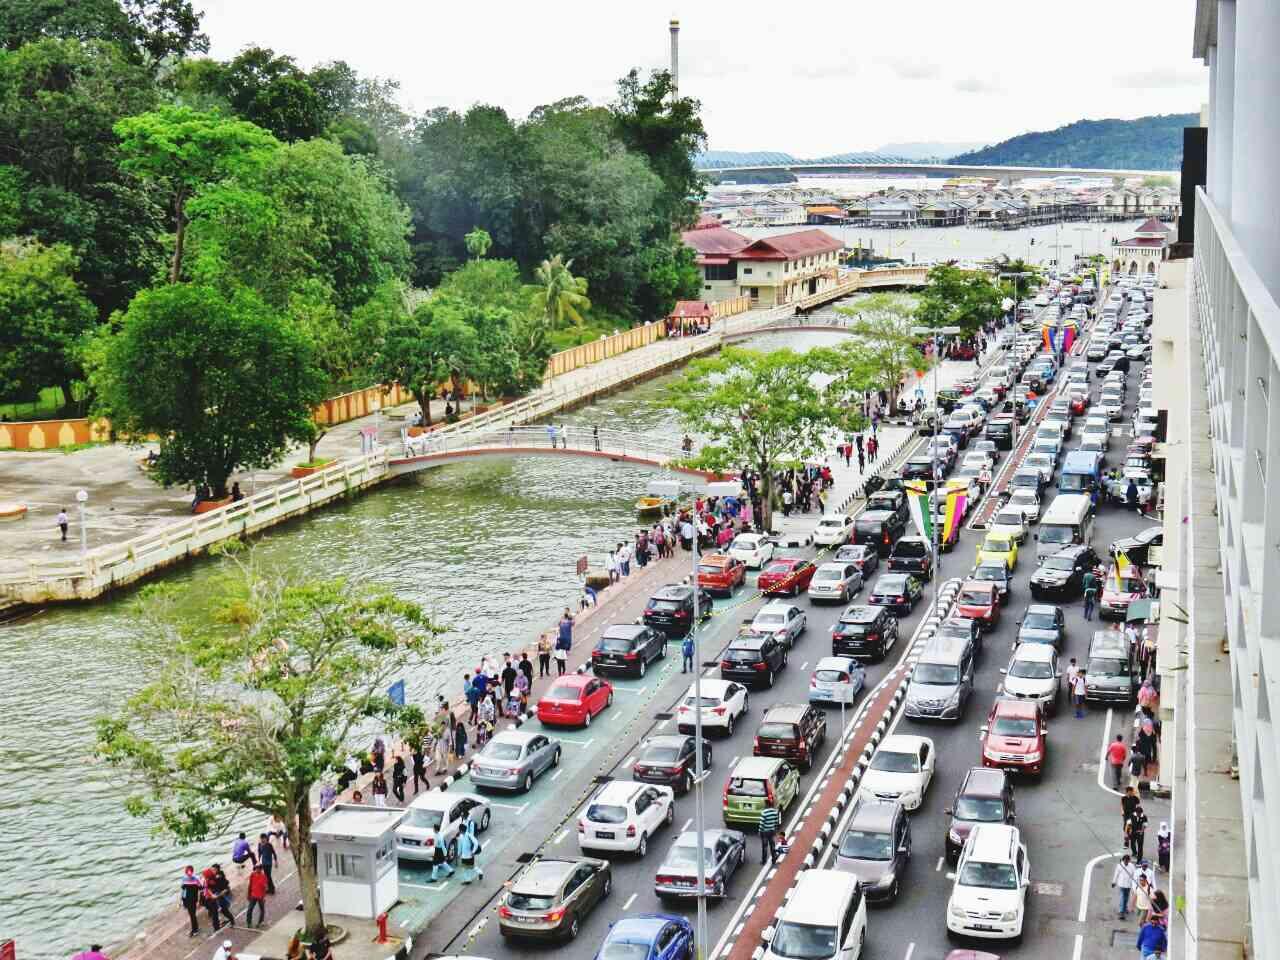 Traffic in Bandar Seri Begawan, Borneo